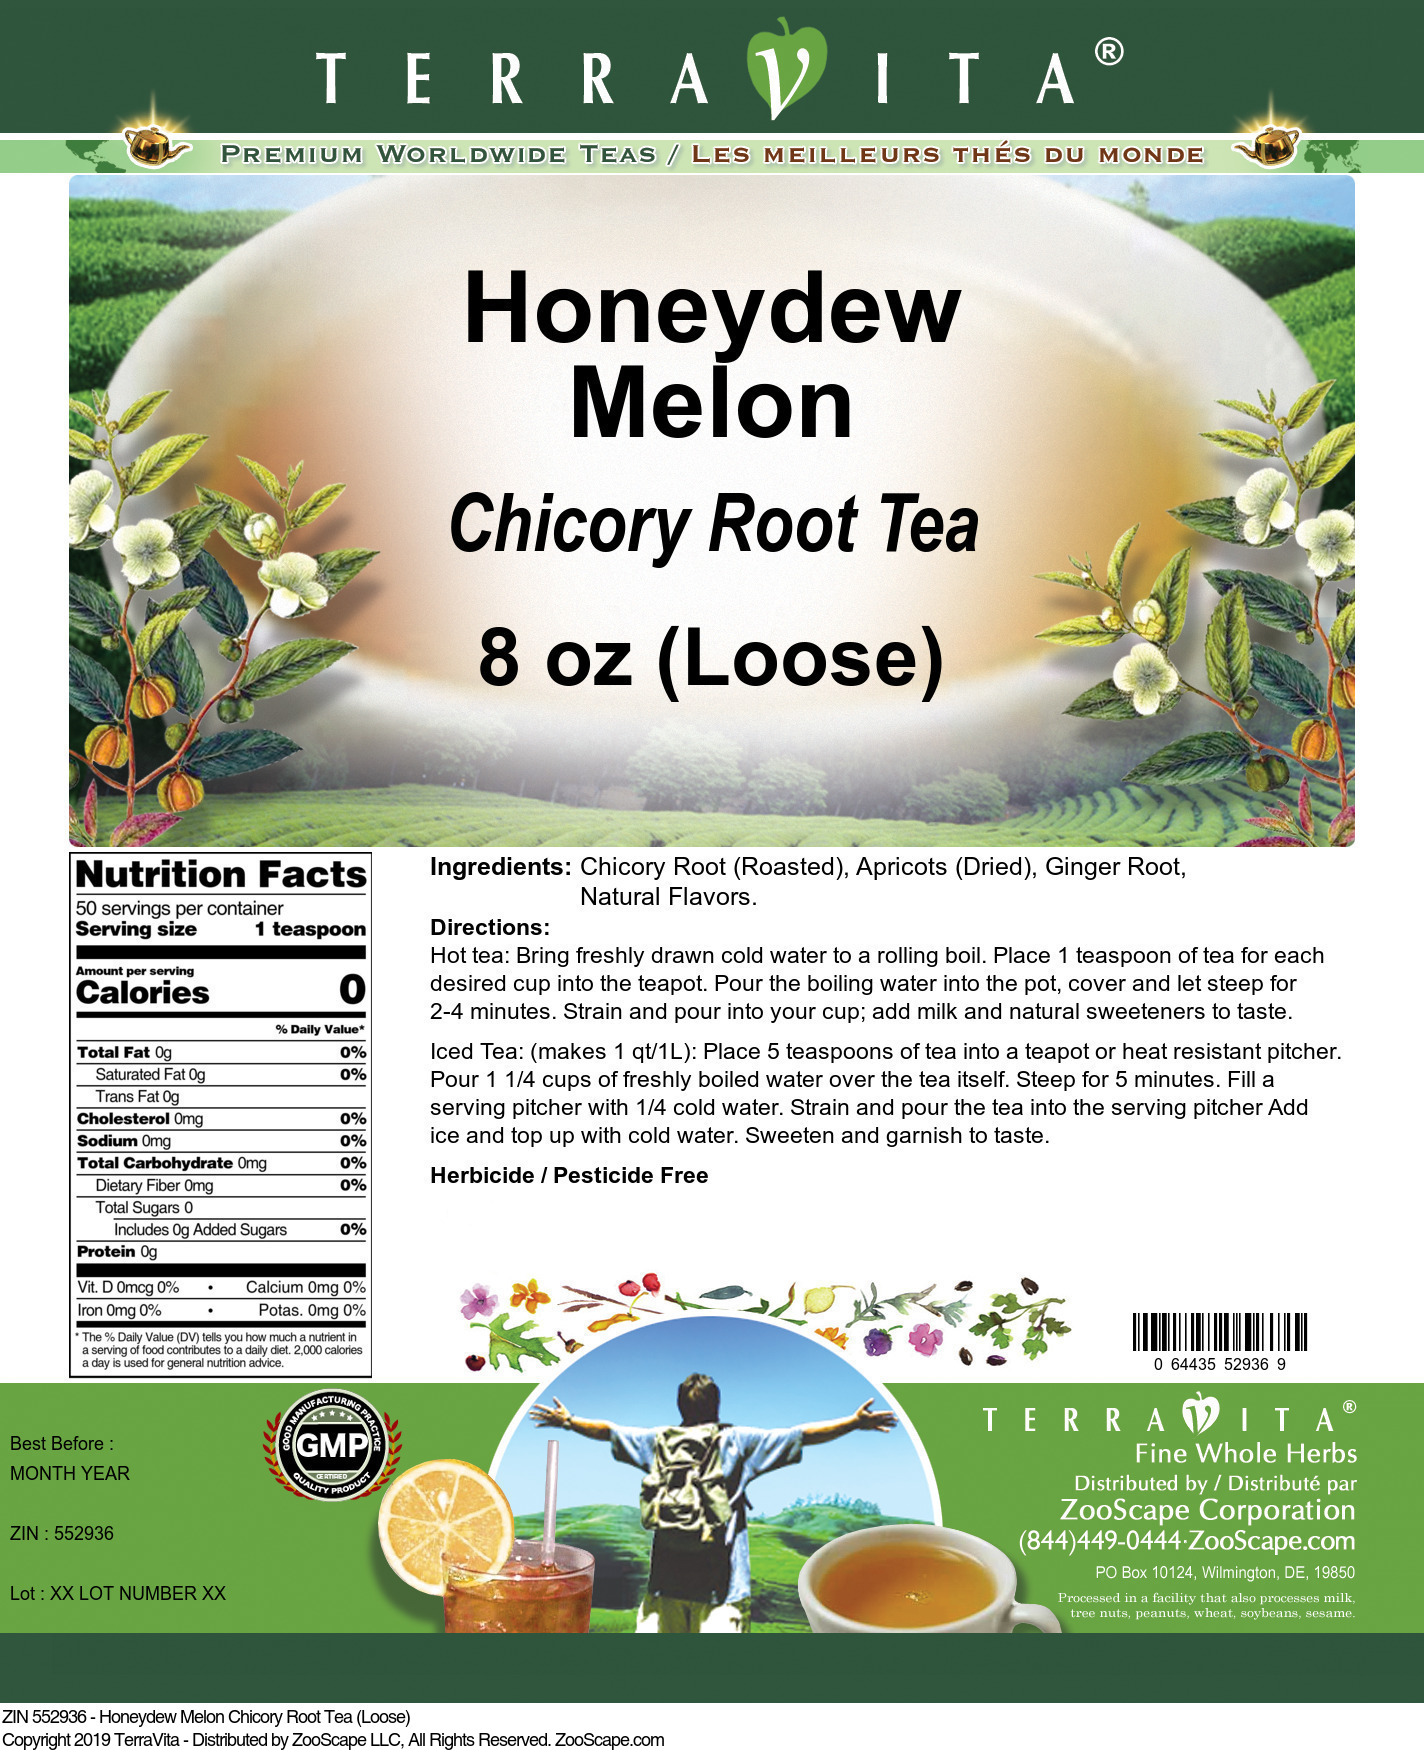 Honeydew Melon Chicory Root